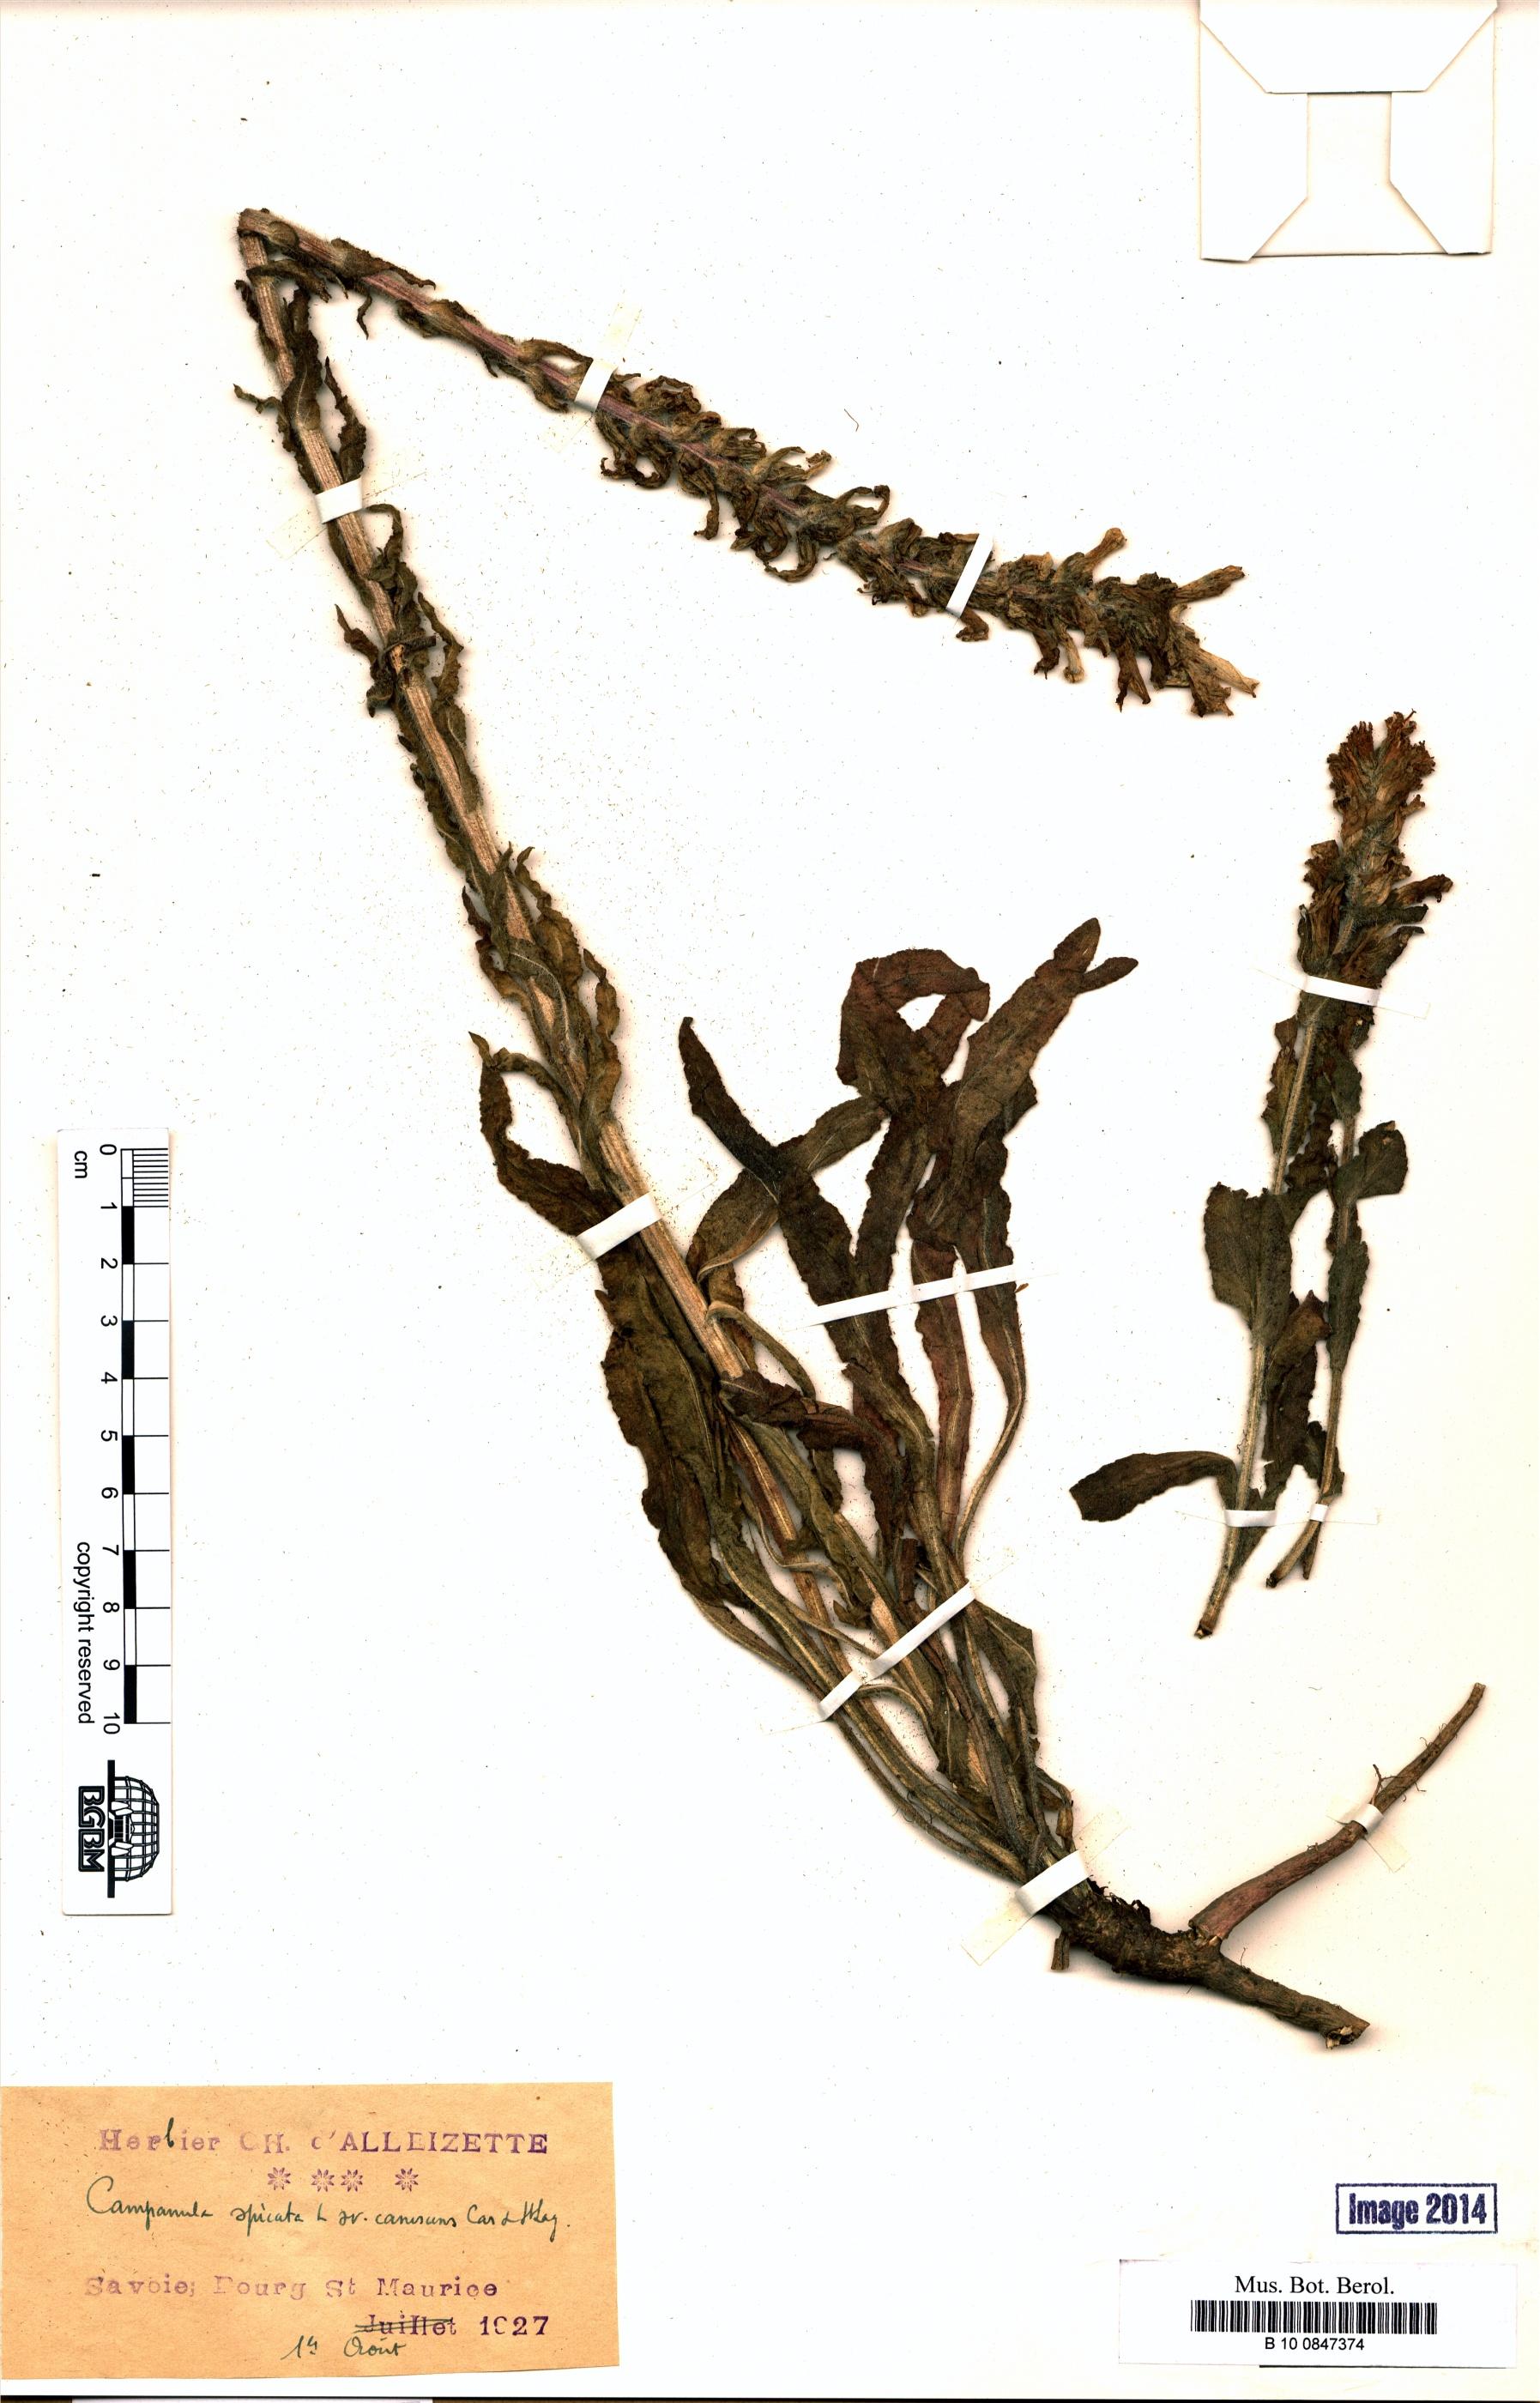 http://ww2.bgbm.org/herbarium/images/B/10/08/47/37/B_10_0847374.jpg